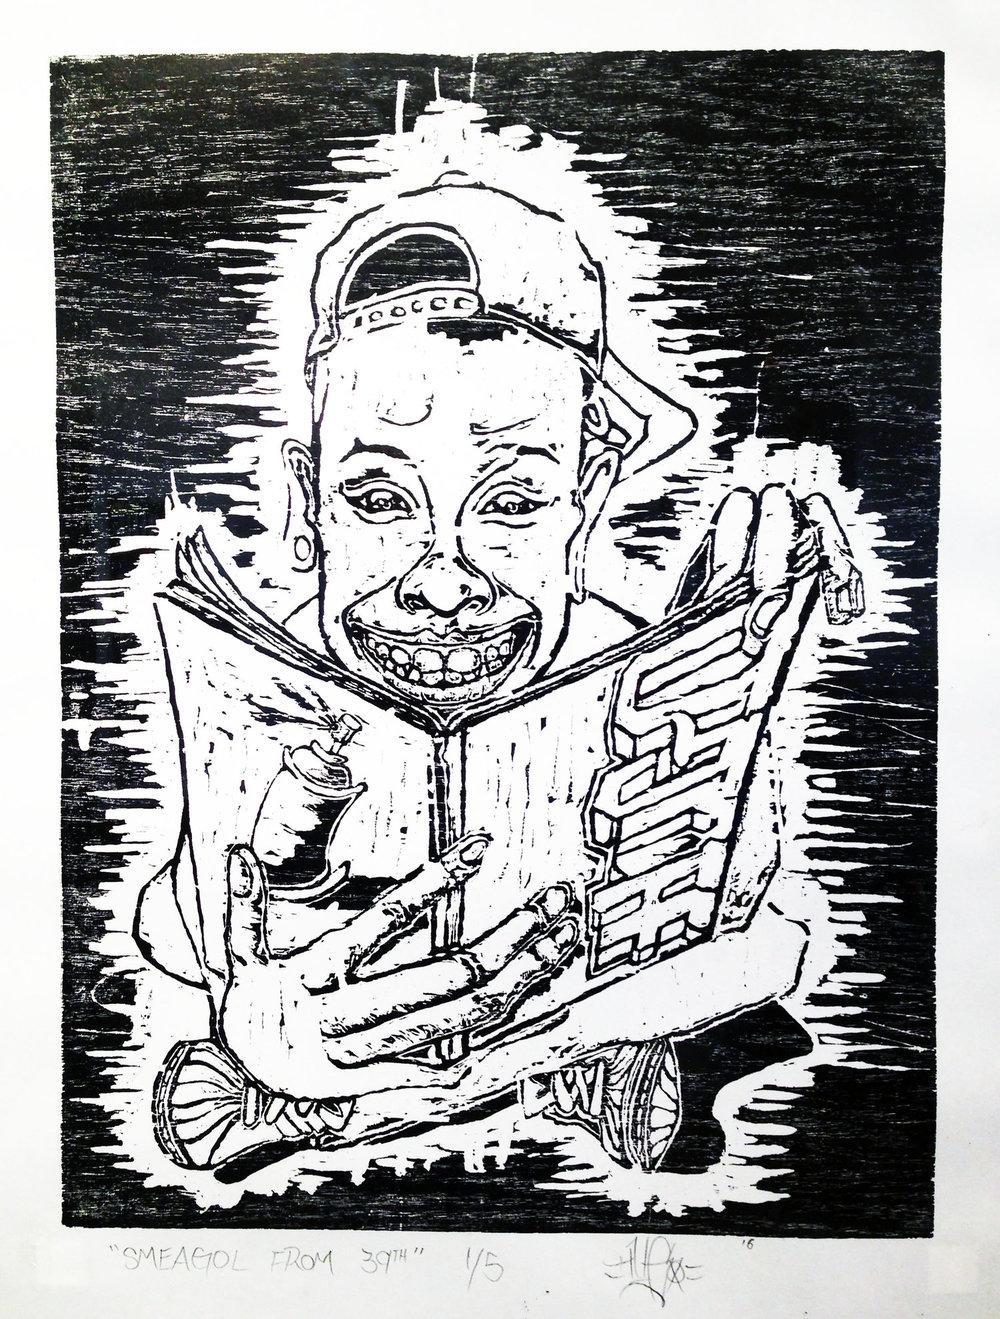 Hugo Zamorano, Smeagol From 39TH , 2016, woodblock print, 29 x21 ½ in.